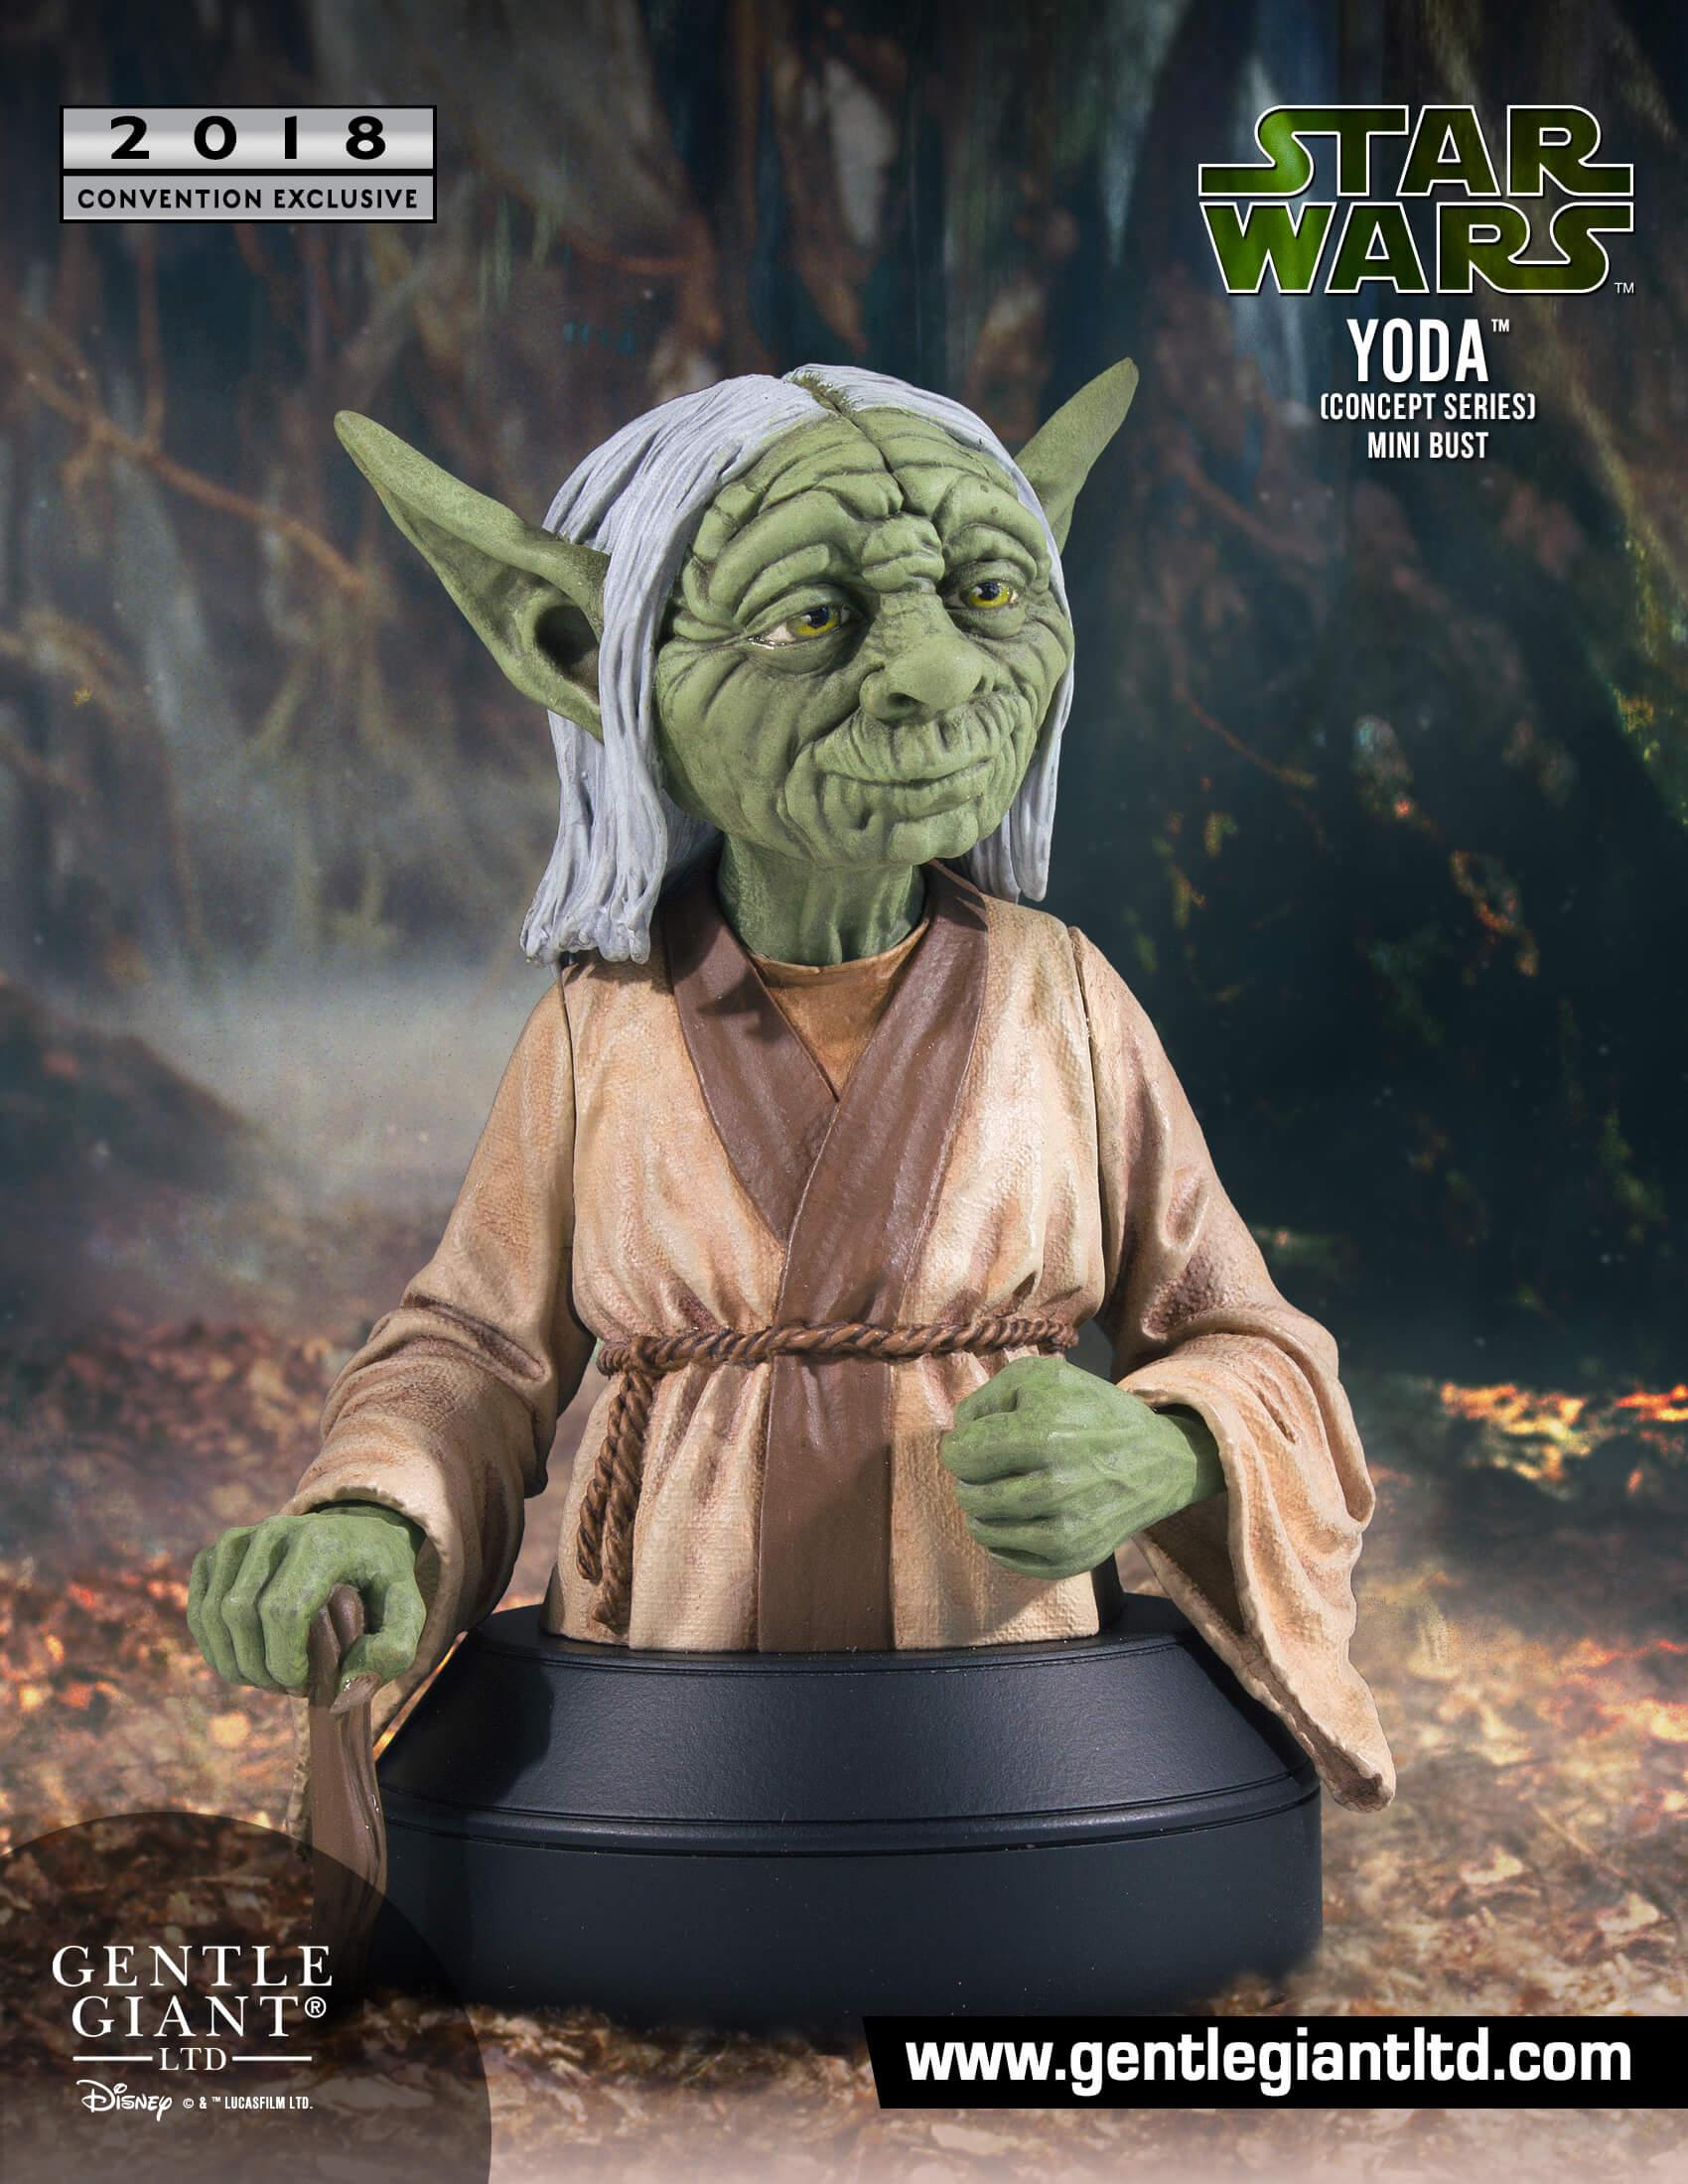 Yoda (Concept Series) Mini Bust